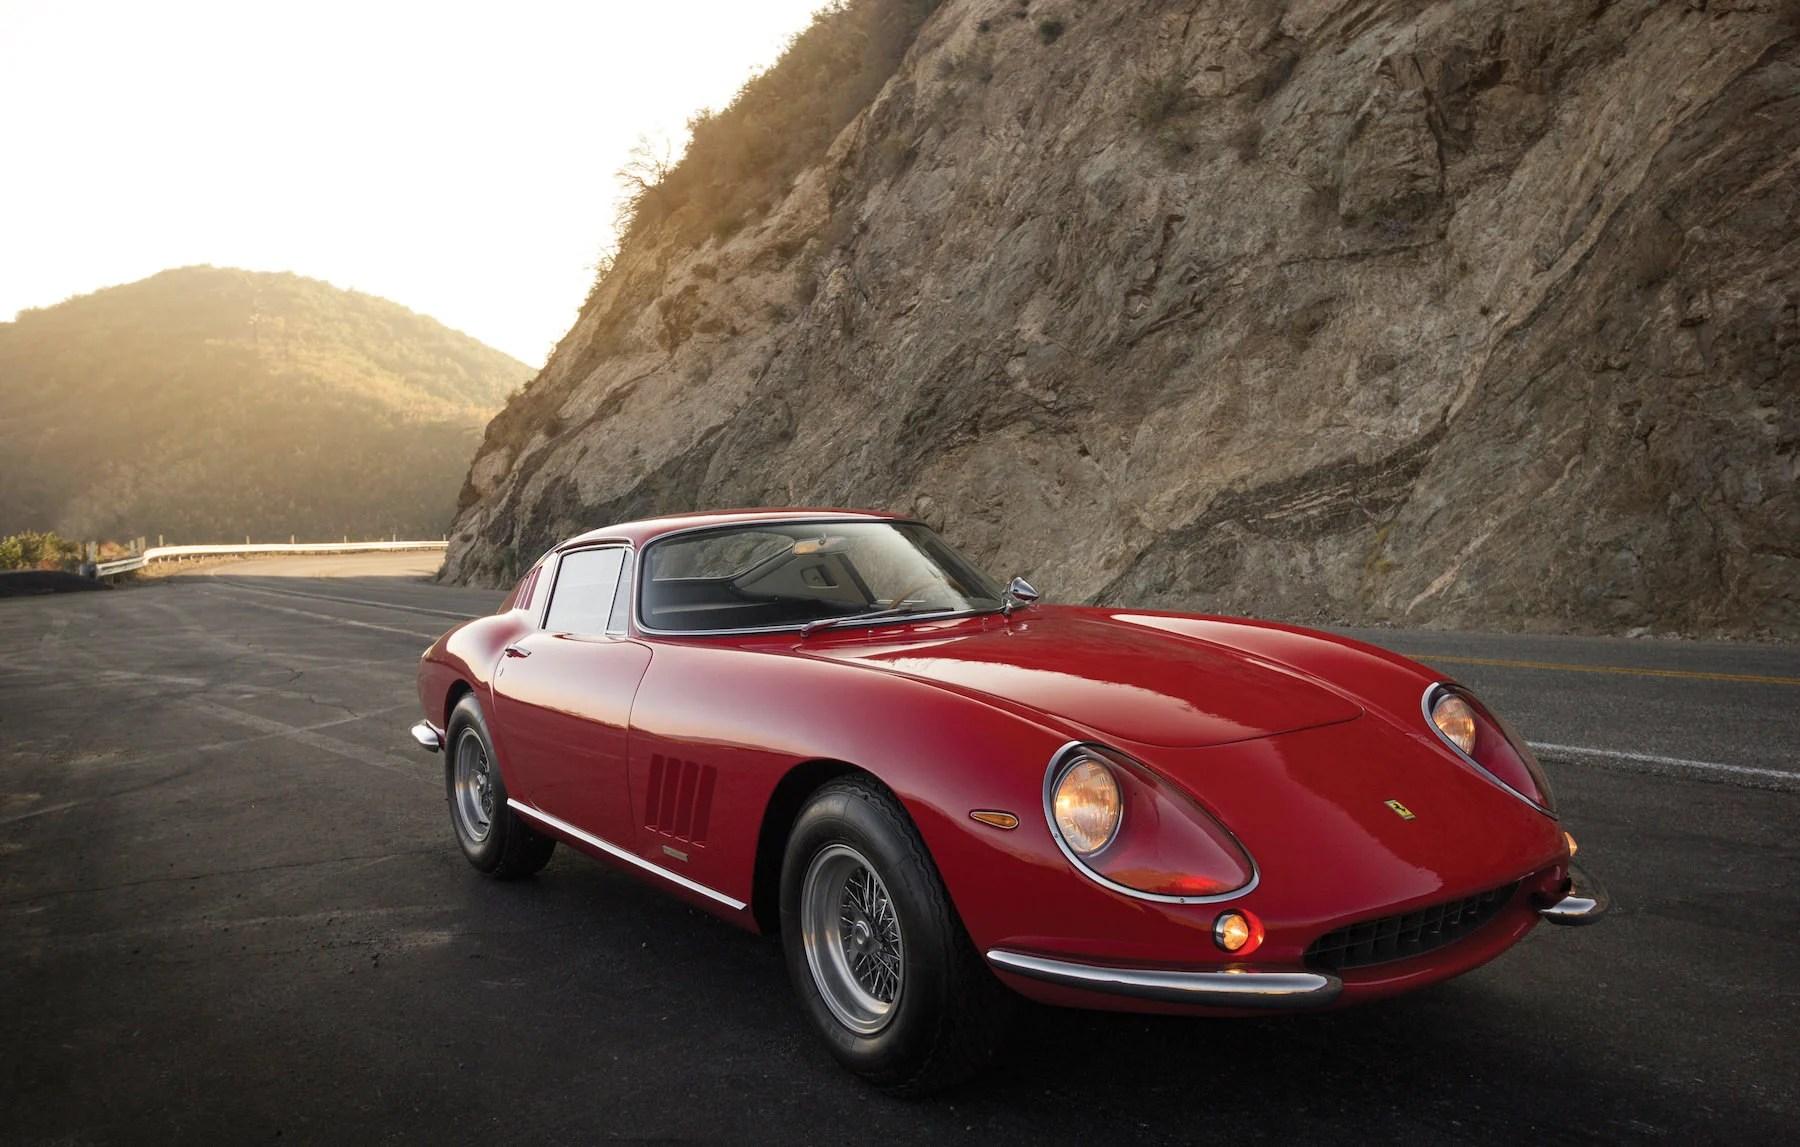 Old Time Car Wallpaper Hd Ferrari 275 Gtb